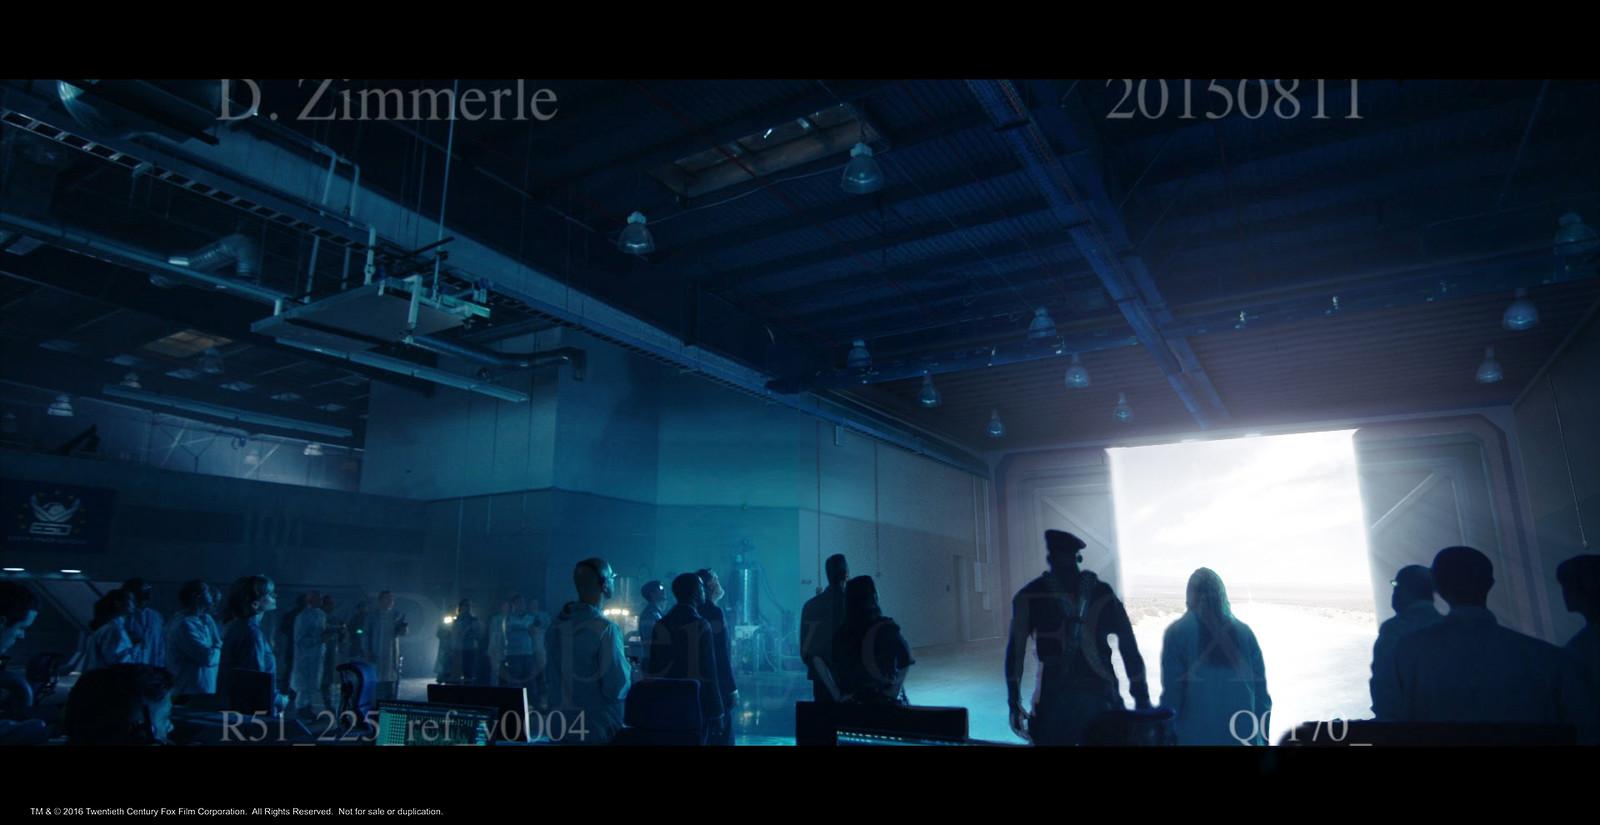 Area 51 hangar set estension.  Part 2 of 4